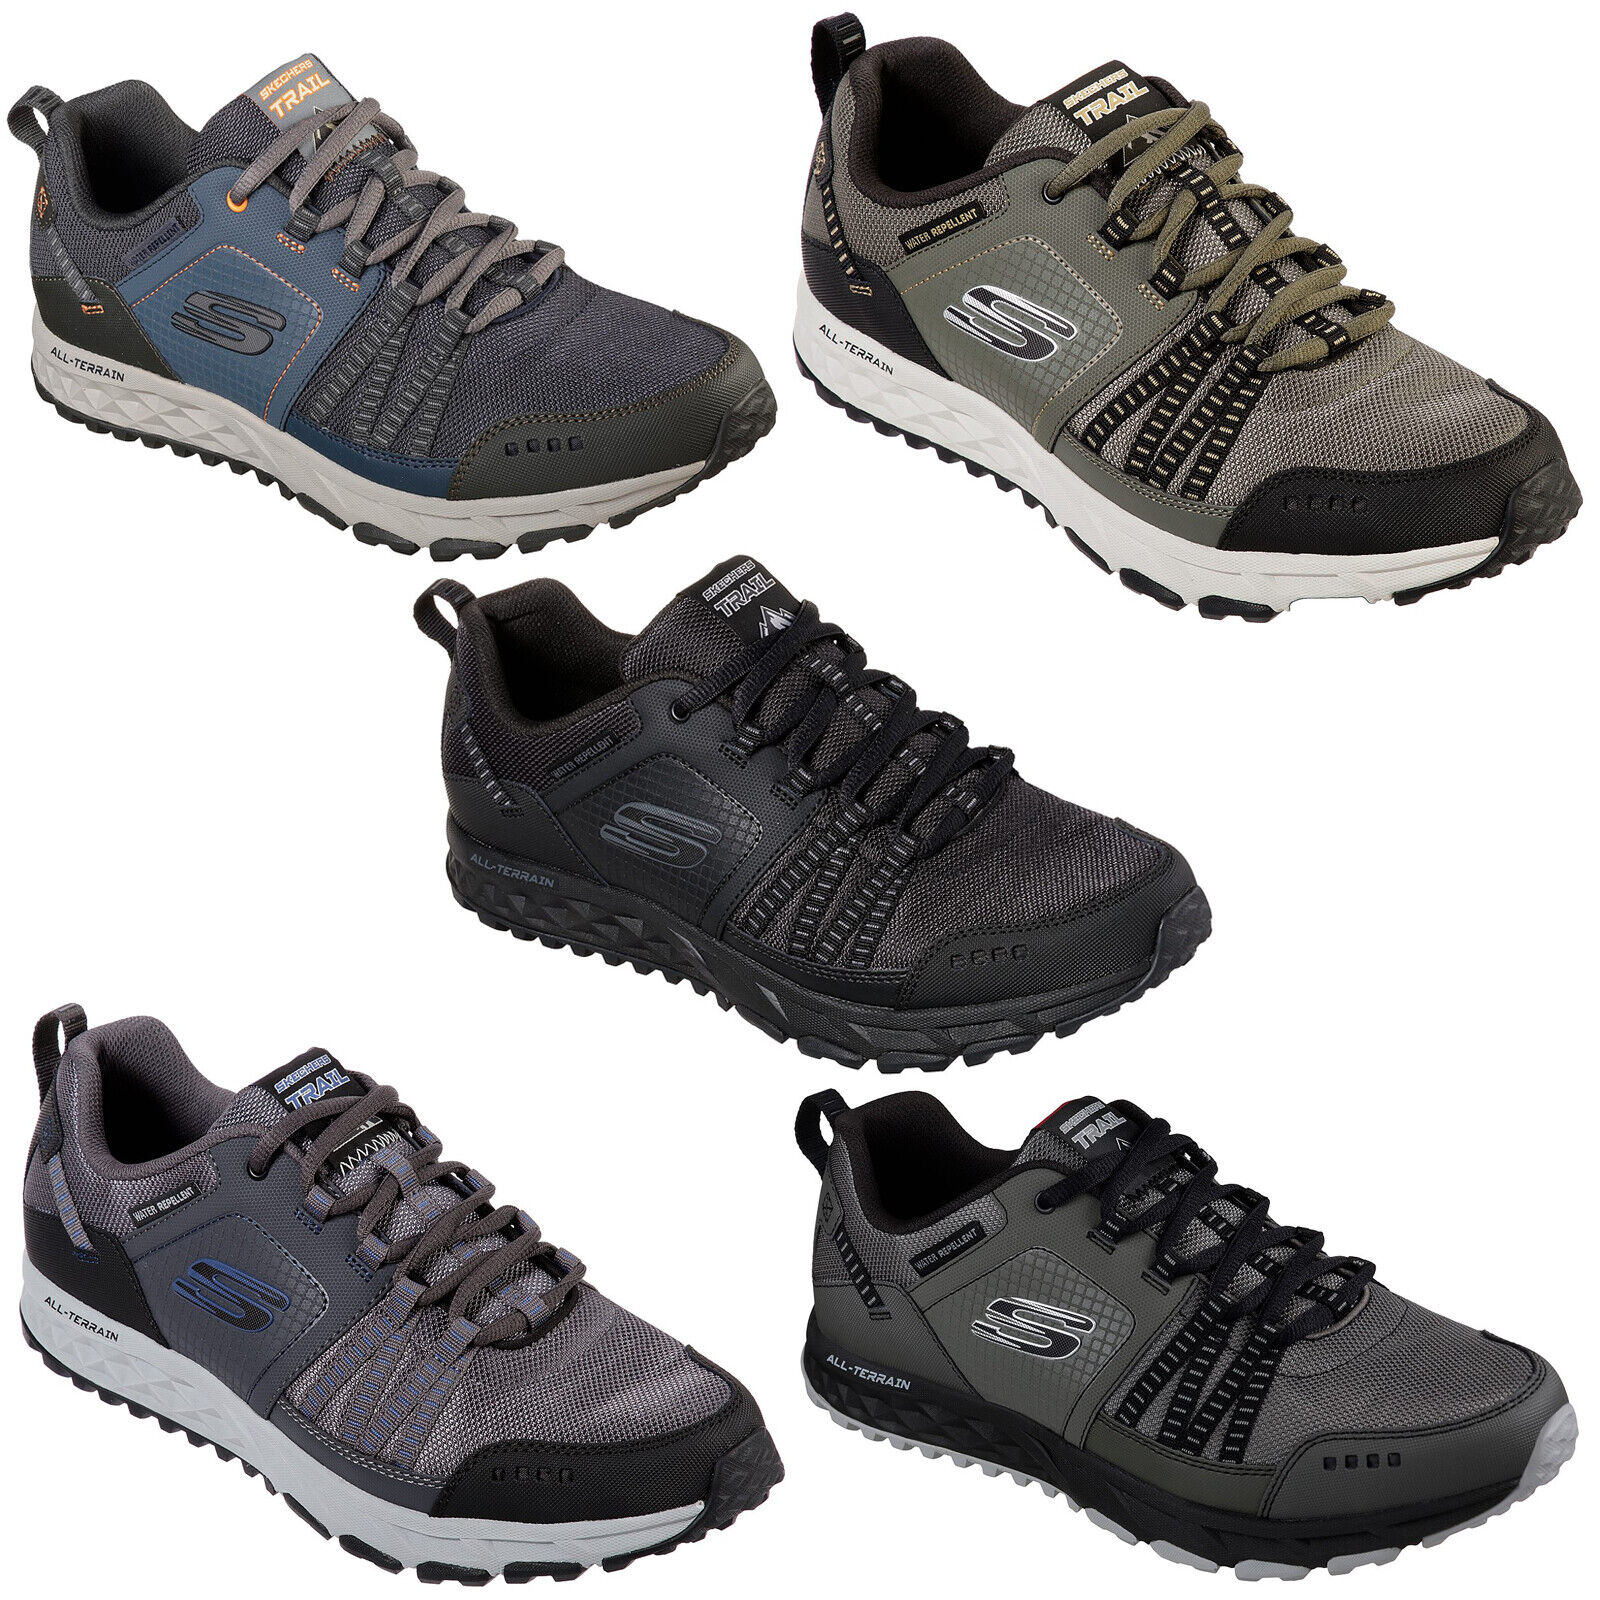 Skechers Escape Plan shoes Mens Memory Foam Hiking Trail Walking Trainers 51591